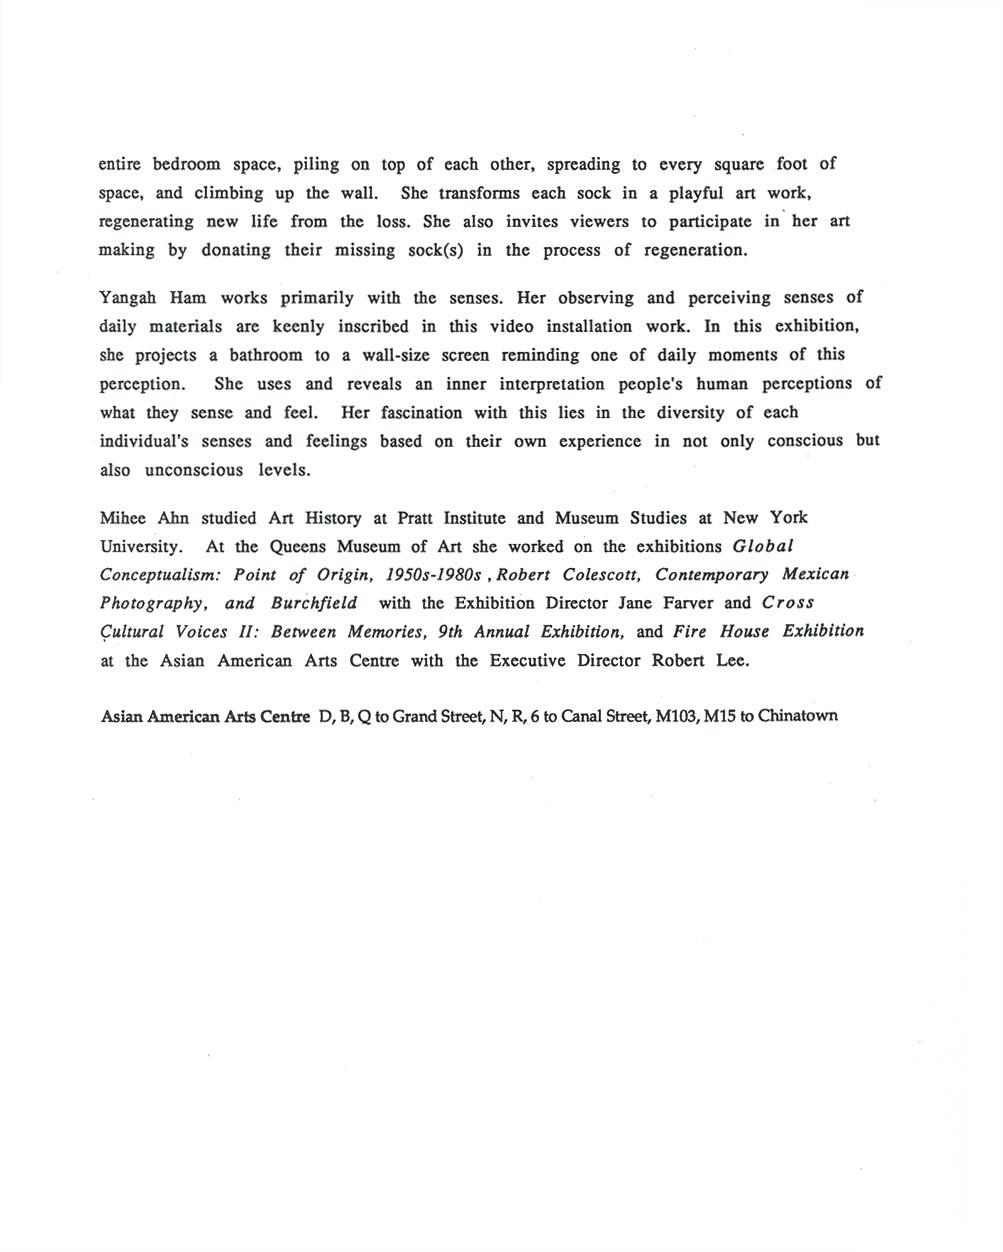 apt #3F, press release, pg 2